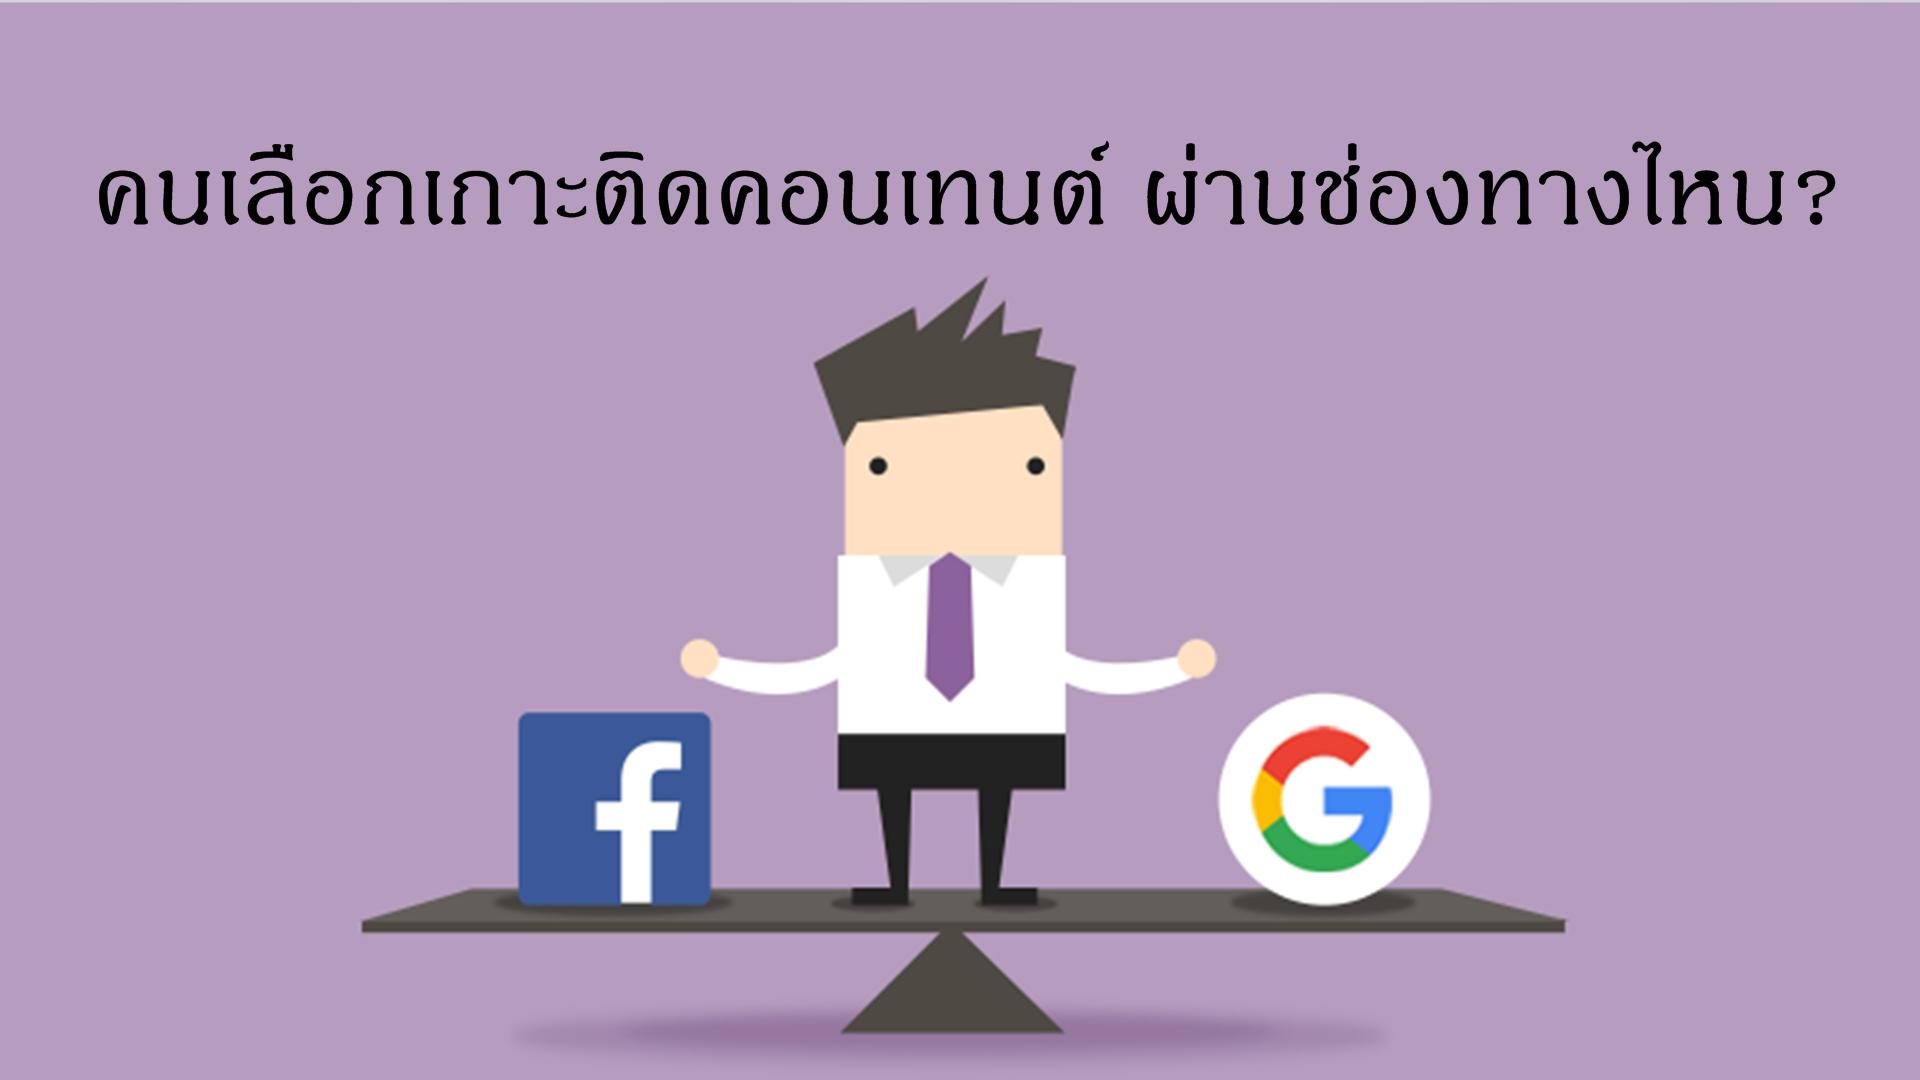 Facebook vs Google คนเลือกเกาะติดคอนเทนต์ ผ่านช่องทางไหน?